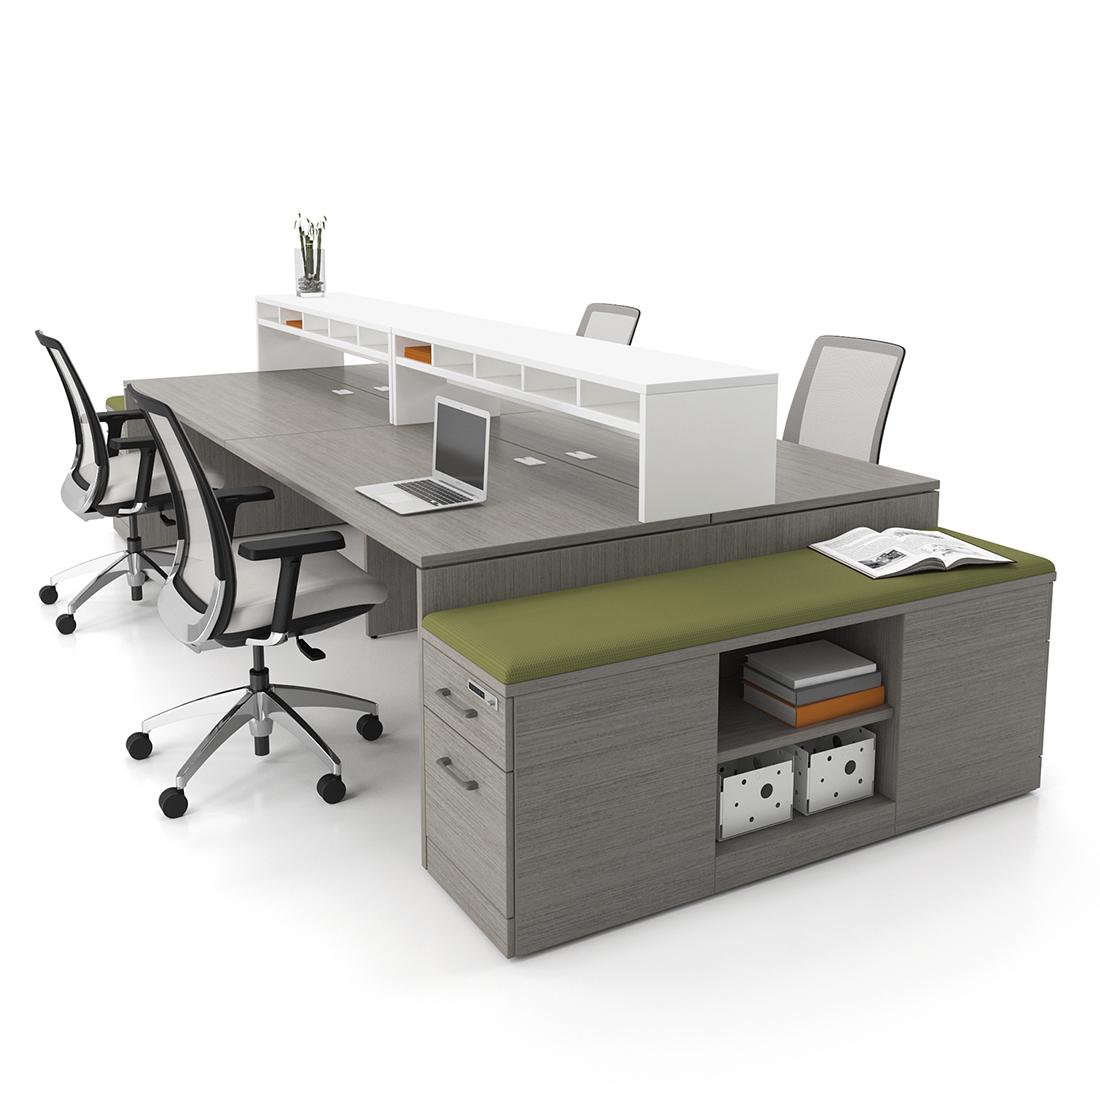 Open Desk with Storage Bench